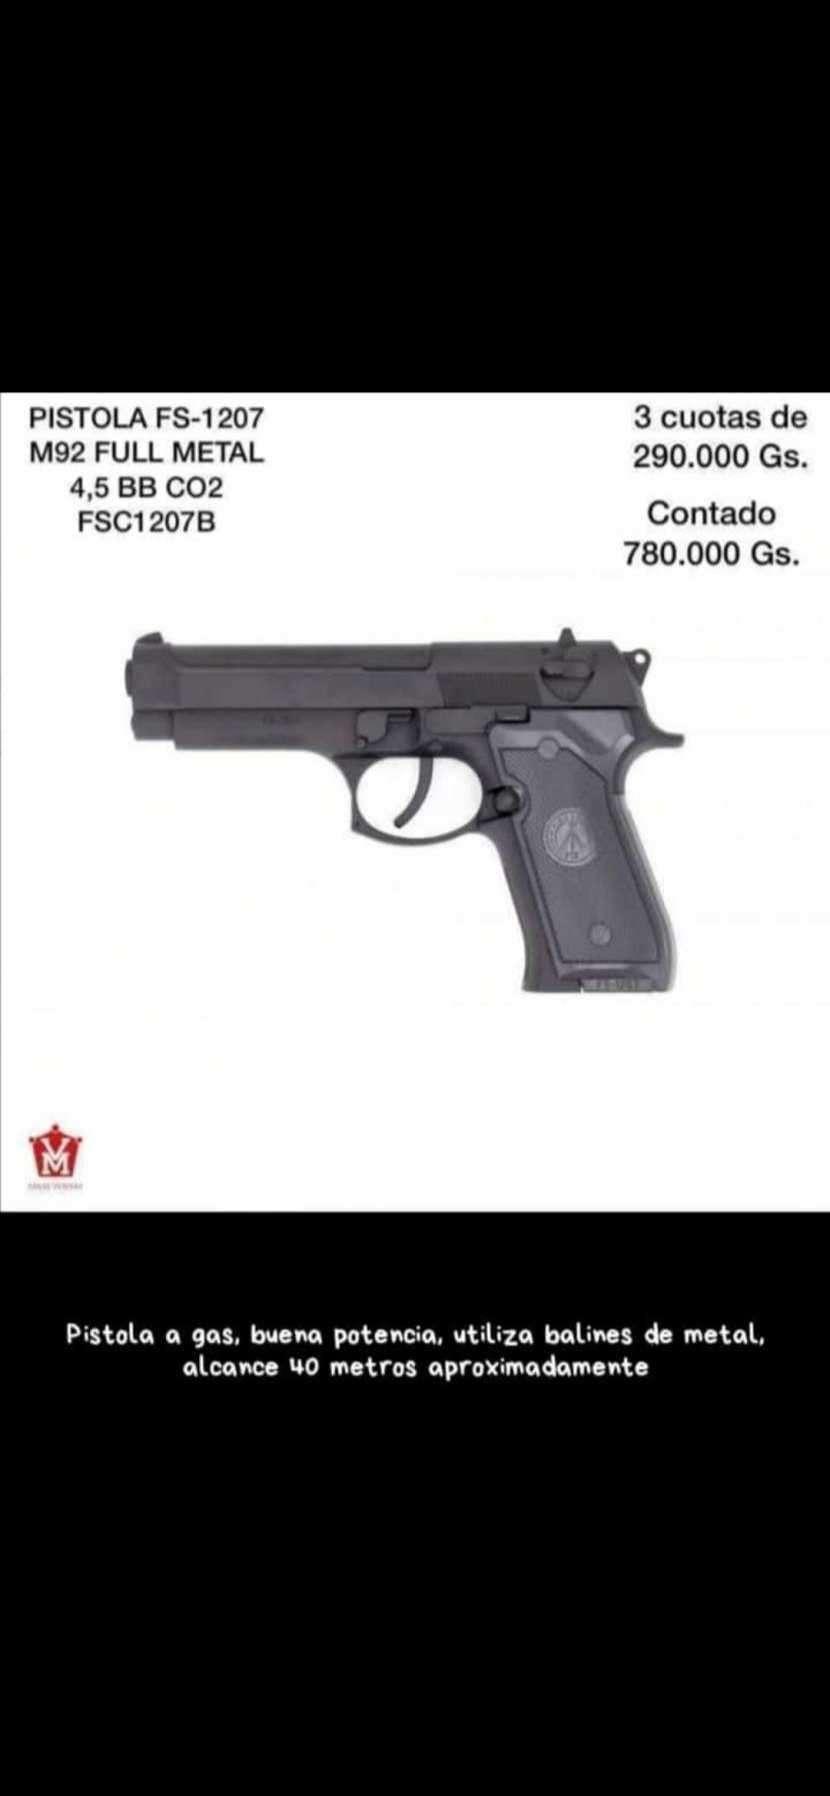 Pistola full metal - 0